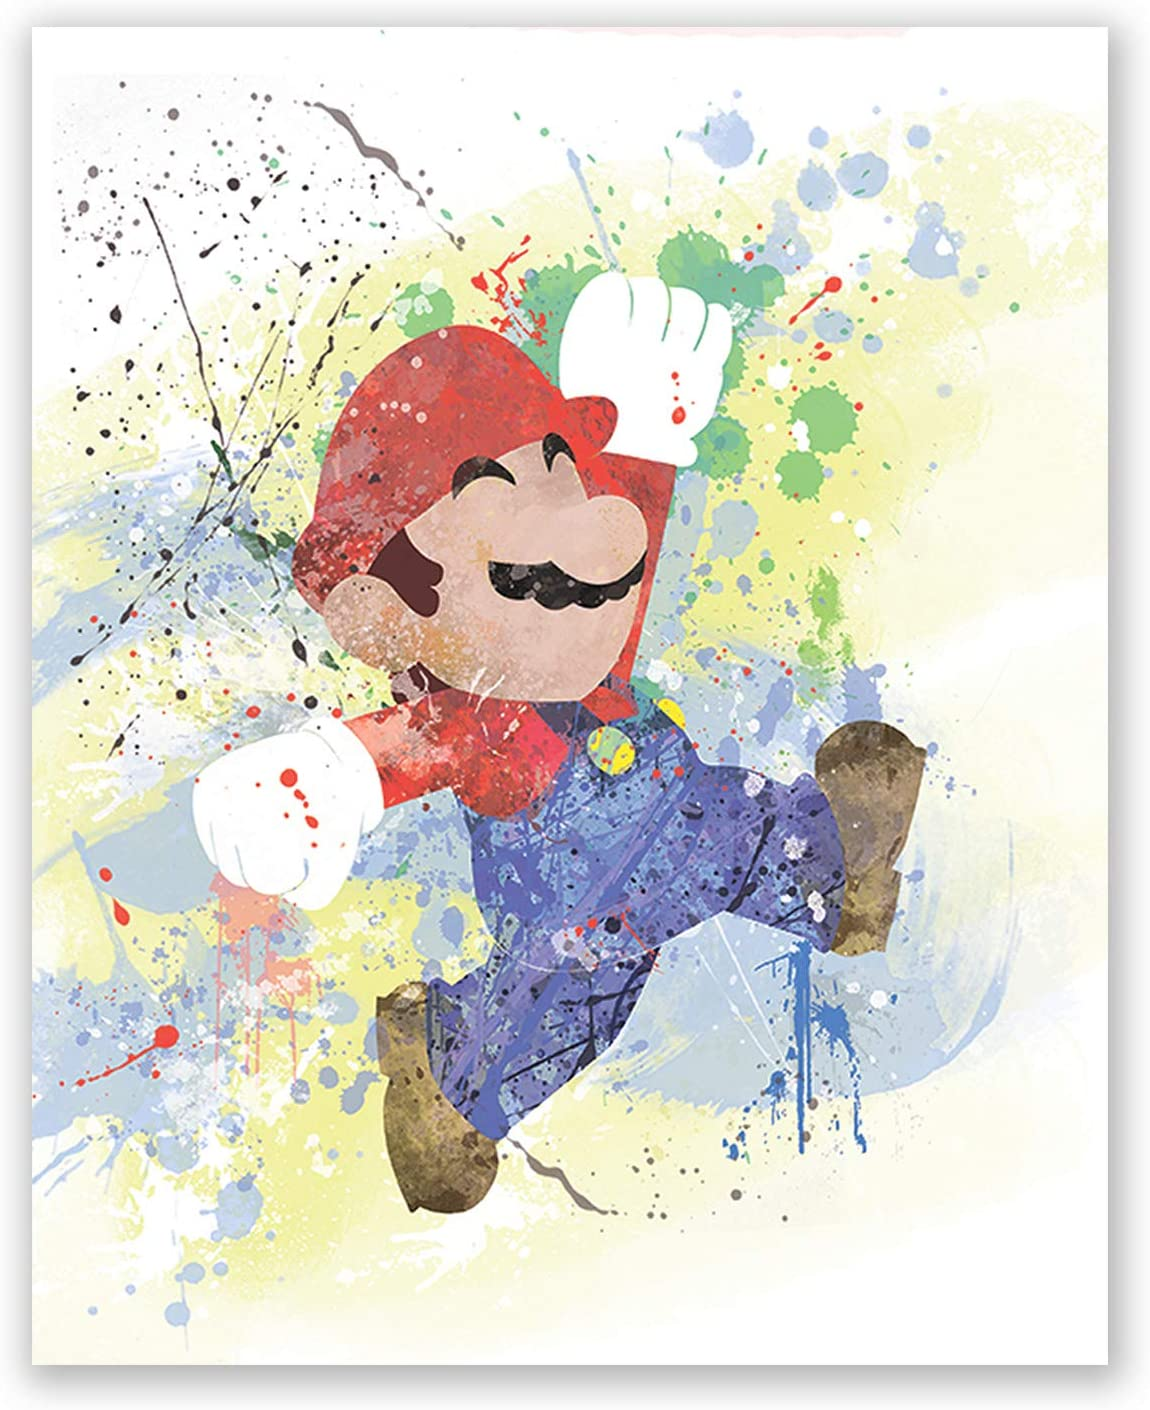 SUPER MARIO BROS CANVAS PRINT Painting Home Wall Decor Art Kids Luigi 3 Sizes